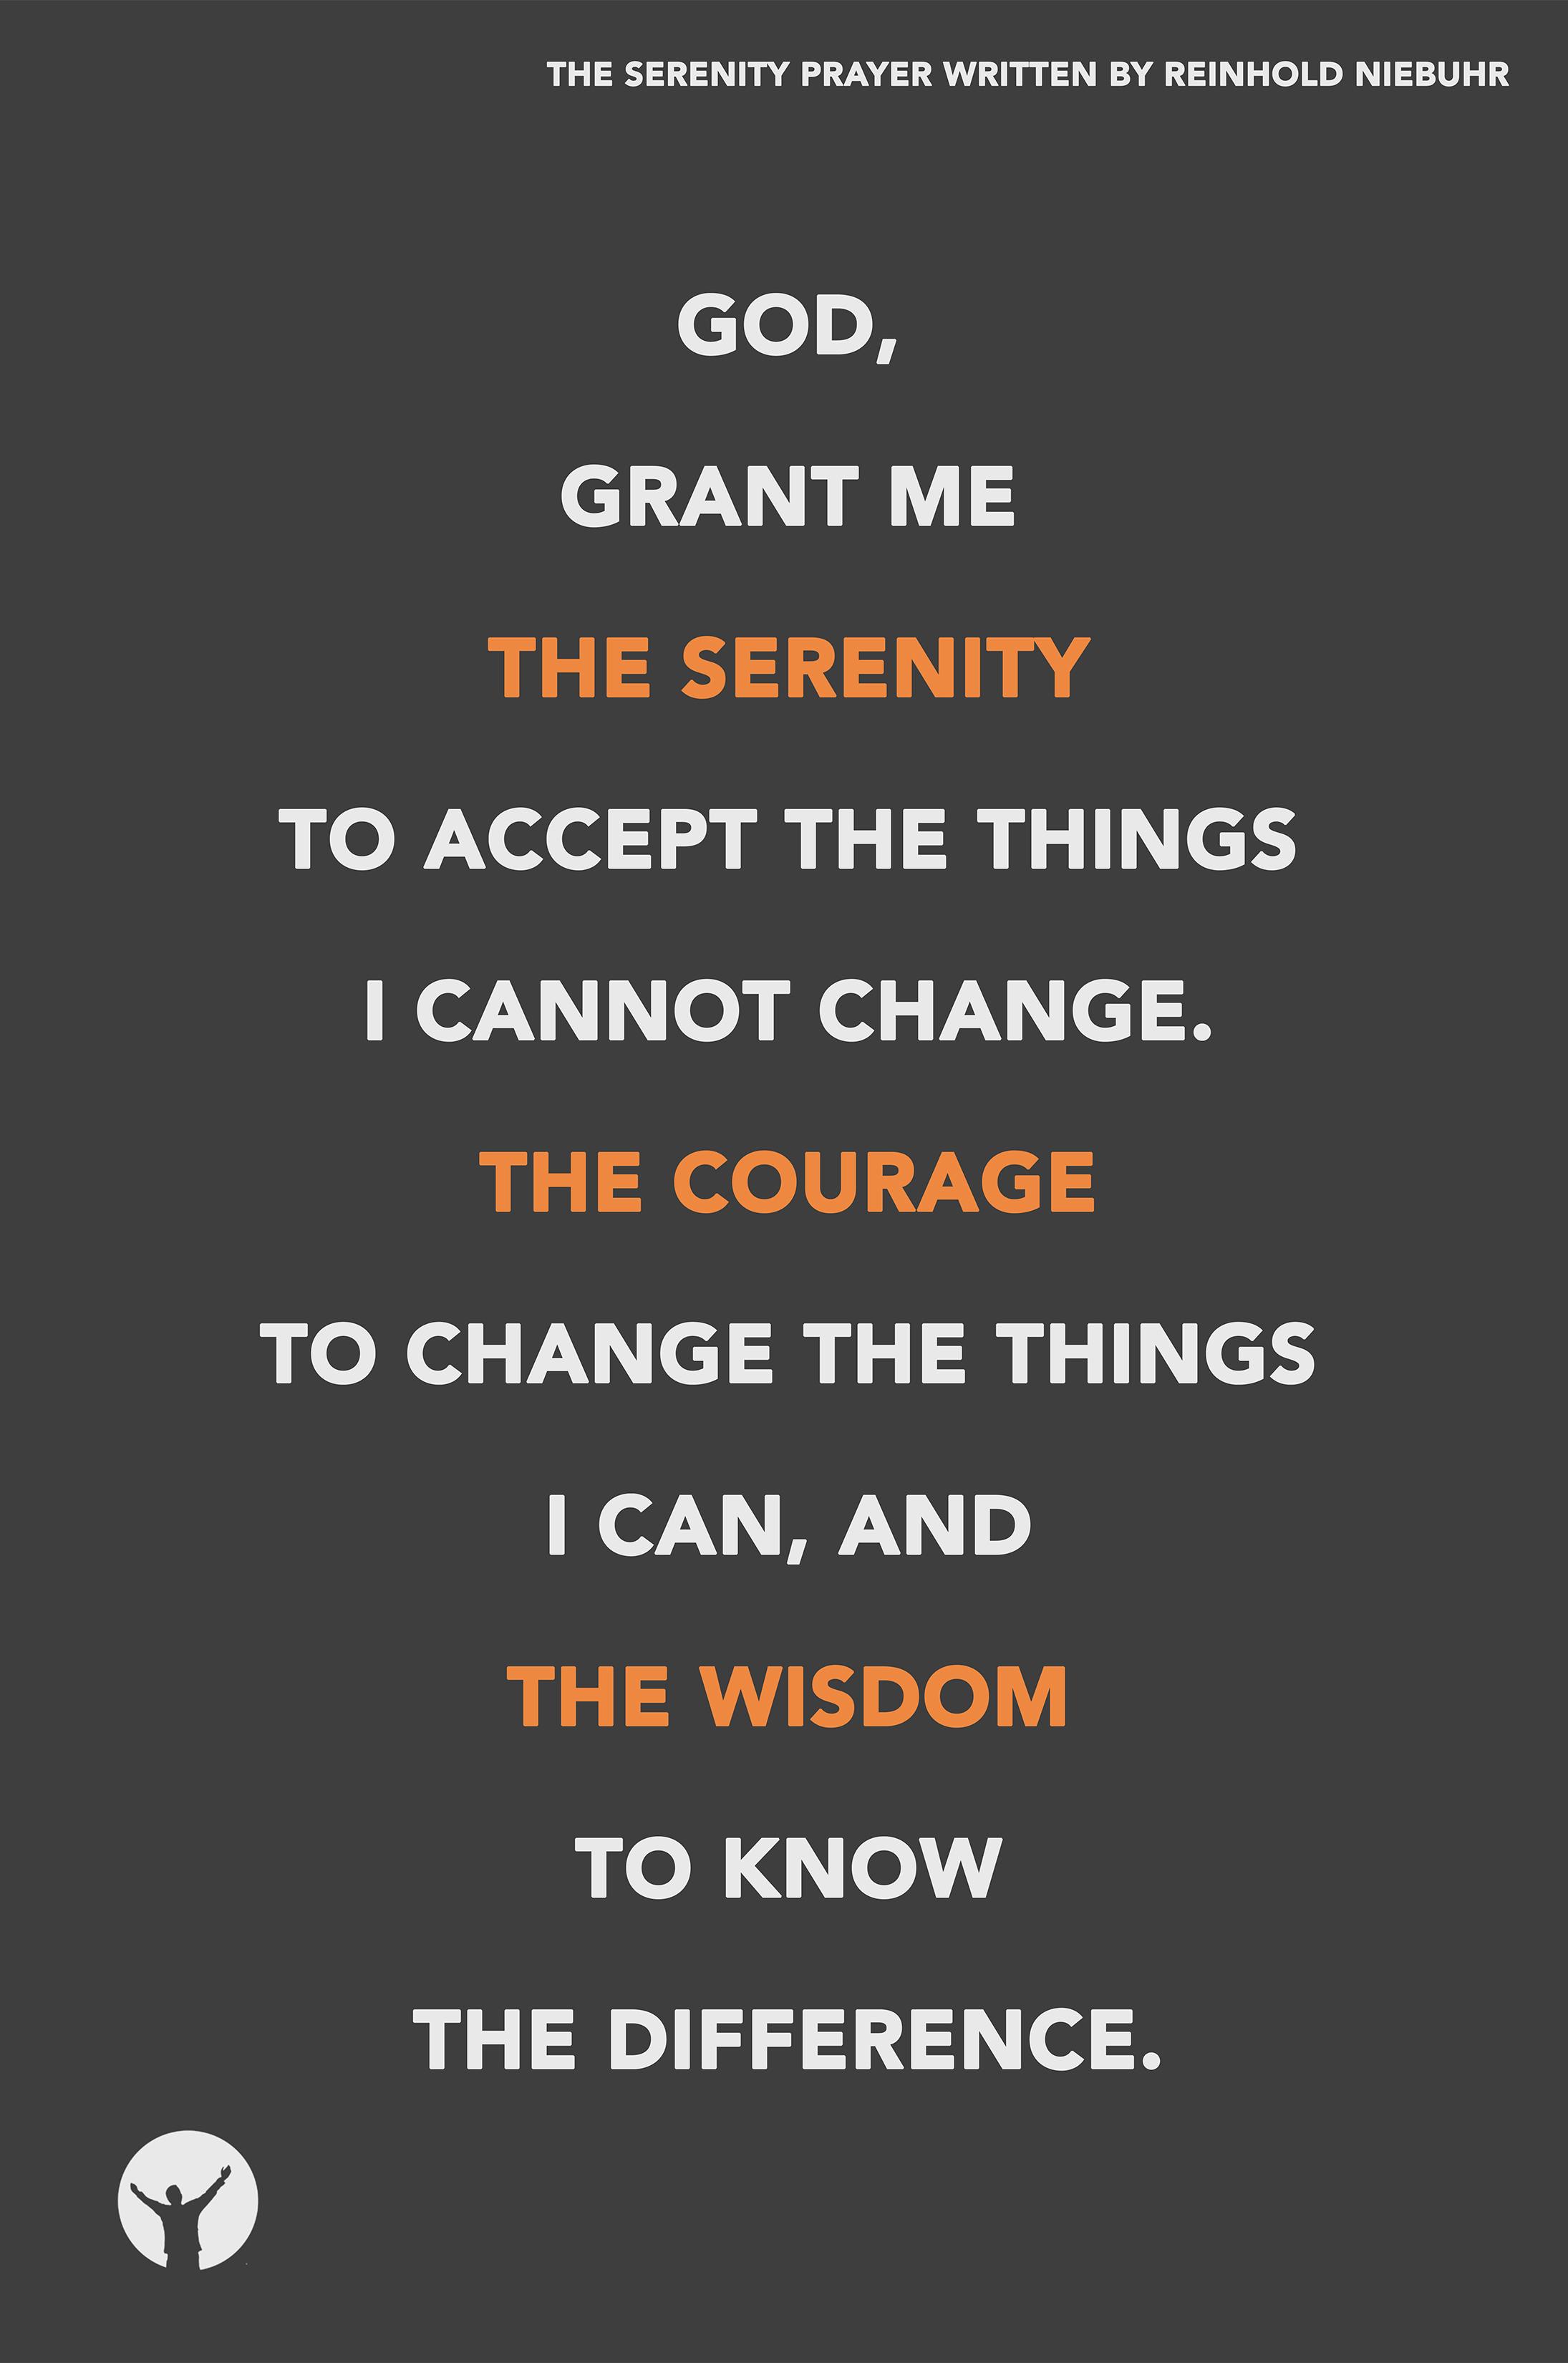 serenity prayer 8x11.jpg